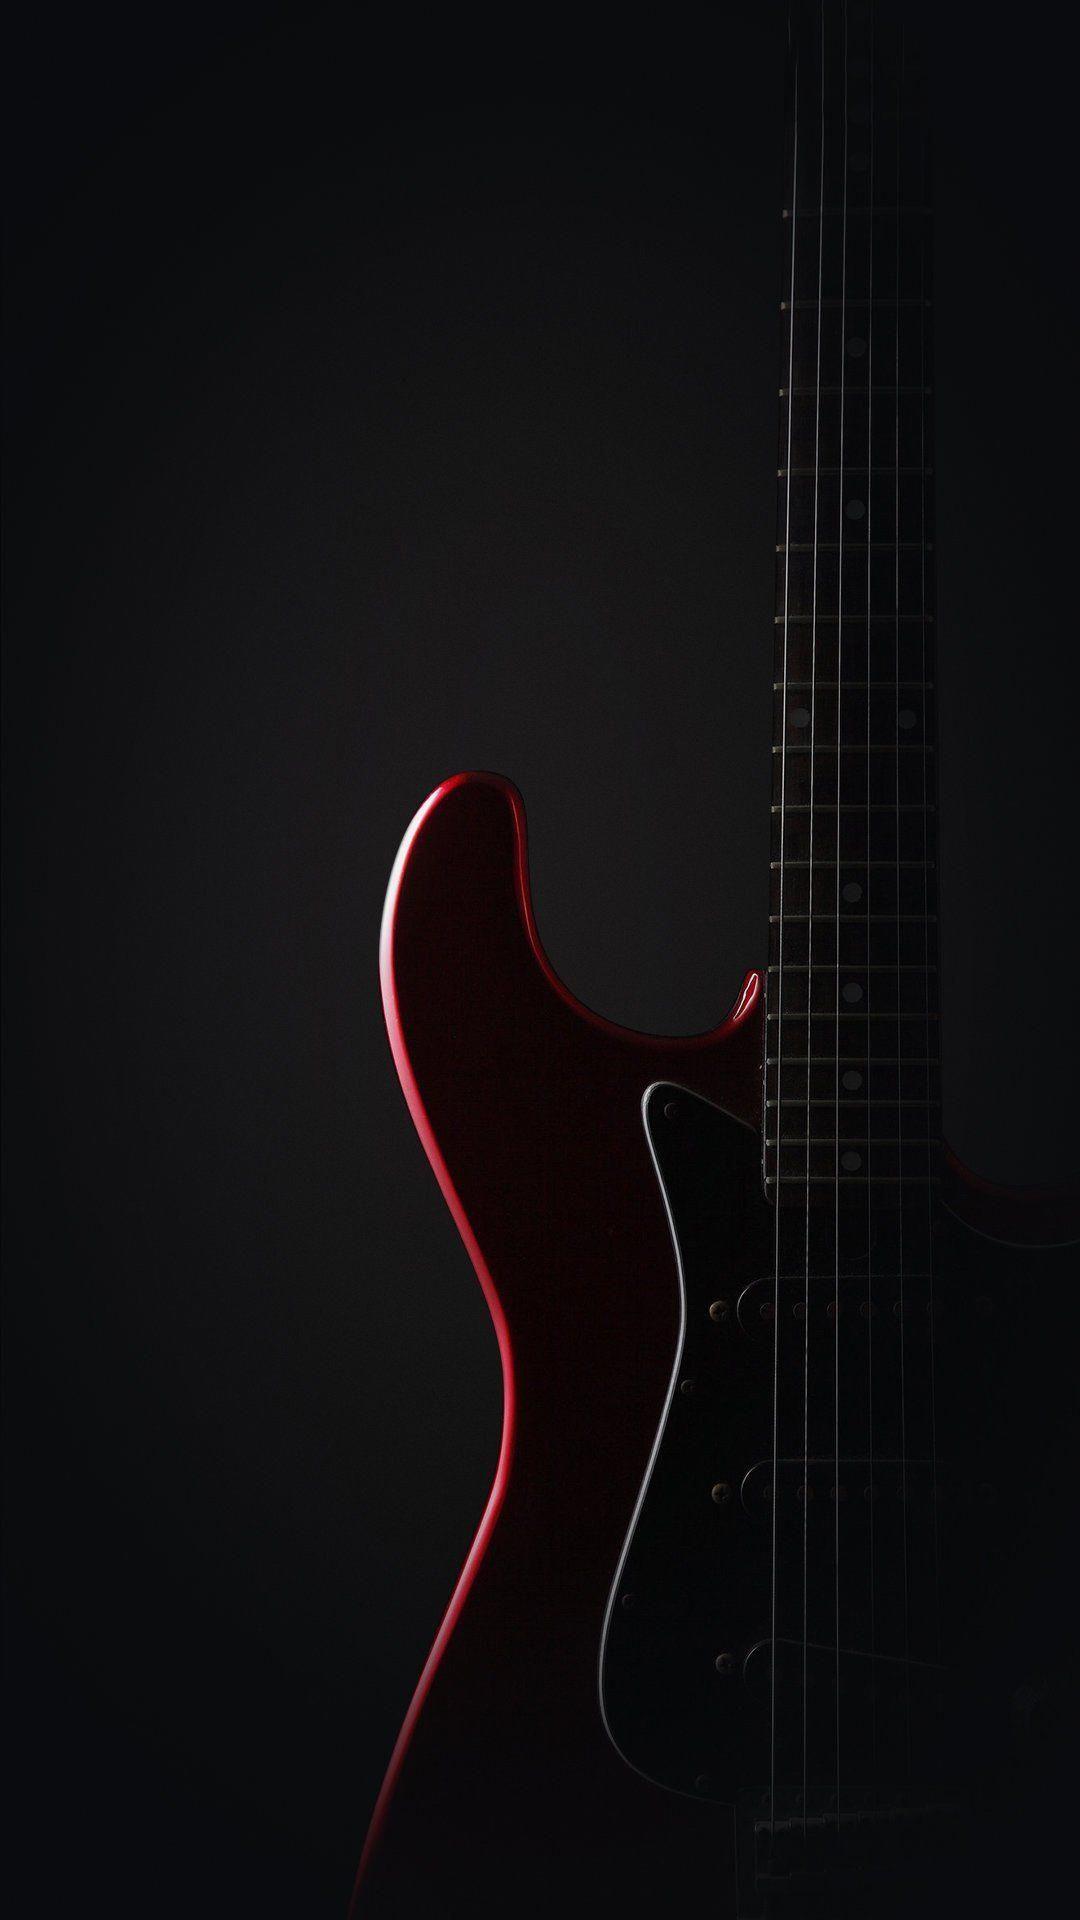 Pin On Gitarok Pengetok Guitar mobile wallpaper hd